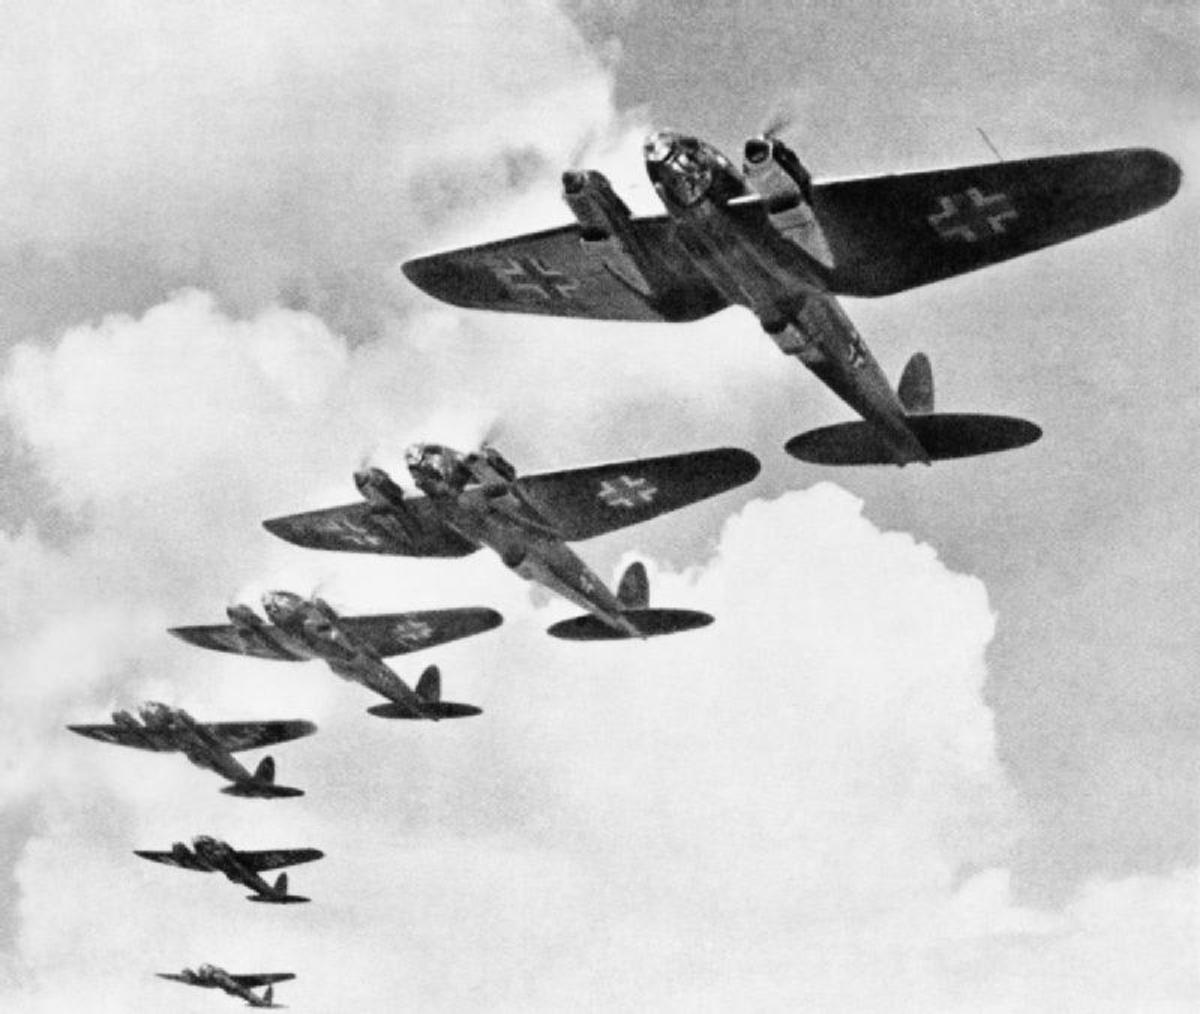 Heinkel He 111s were used to carpet bomb Stalingrad. German air raids ultimately killed 40,000 civilians in Stalingrad.